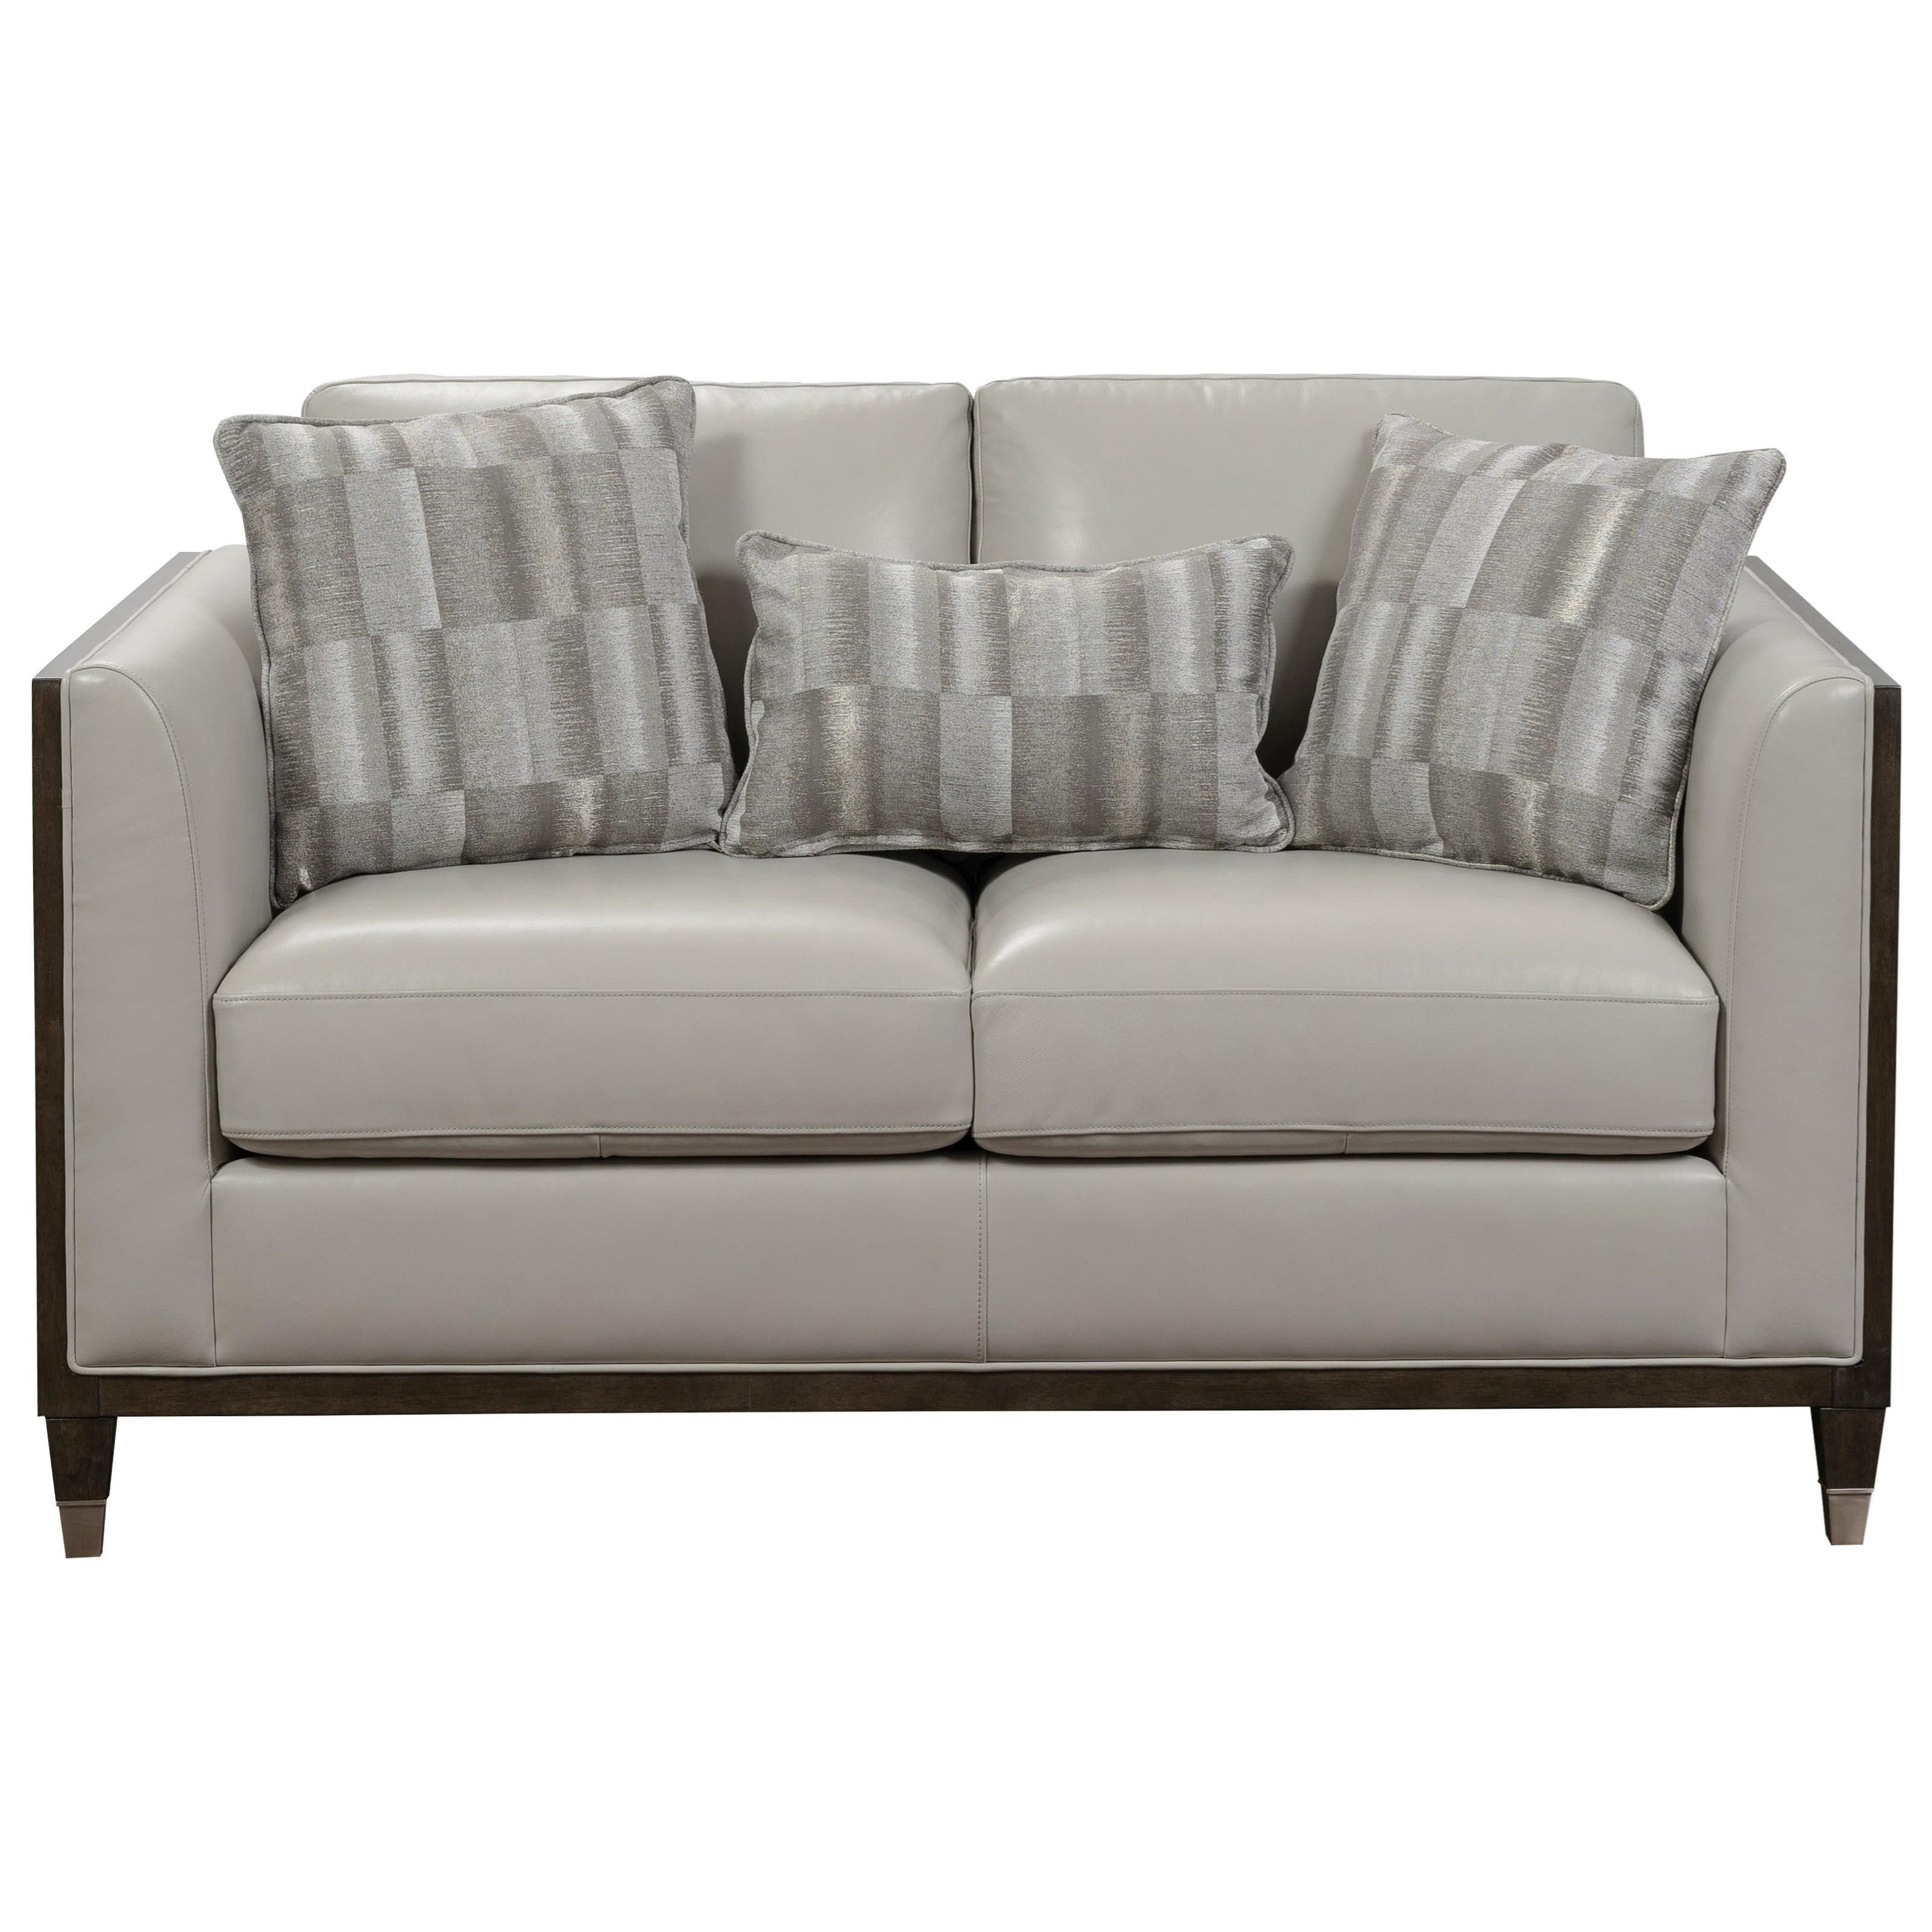 Addison Stationary Uph Matching Loveseat by Pulaski Furniture at Alison Craig Home Furnishings